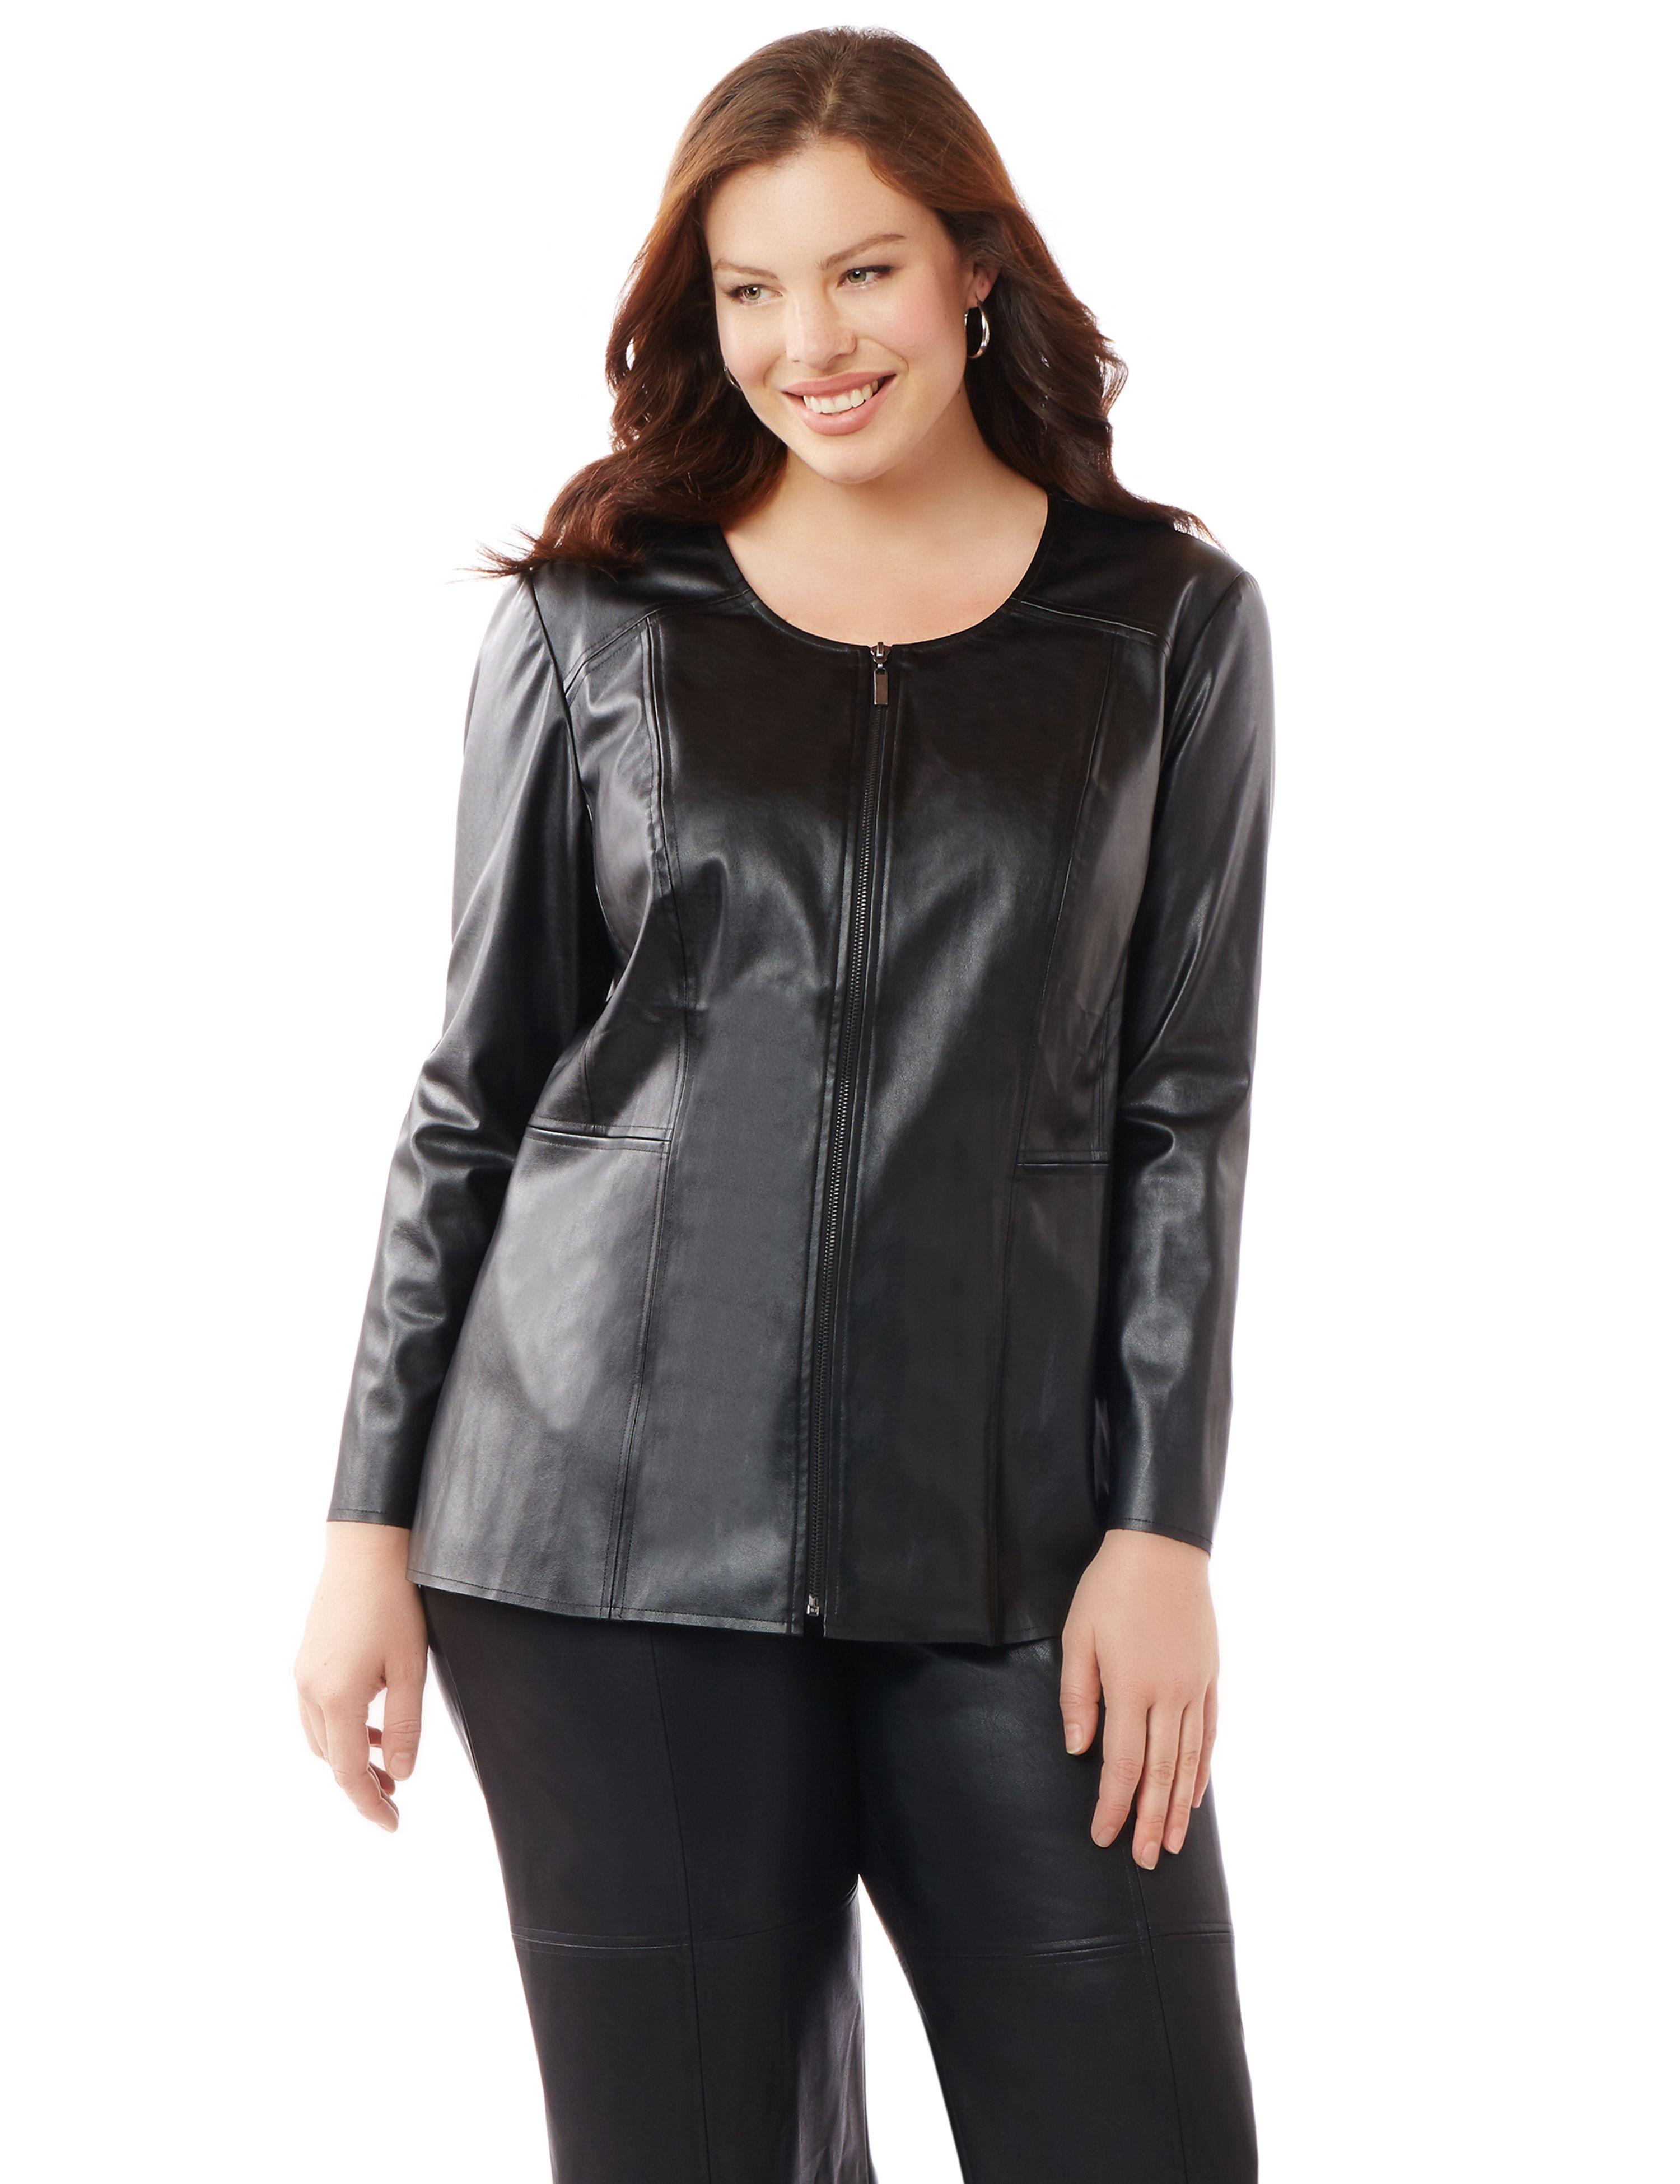 Black Label Leatherette Jacket Leather jacket, Pocket